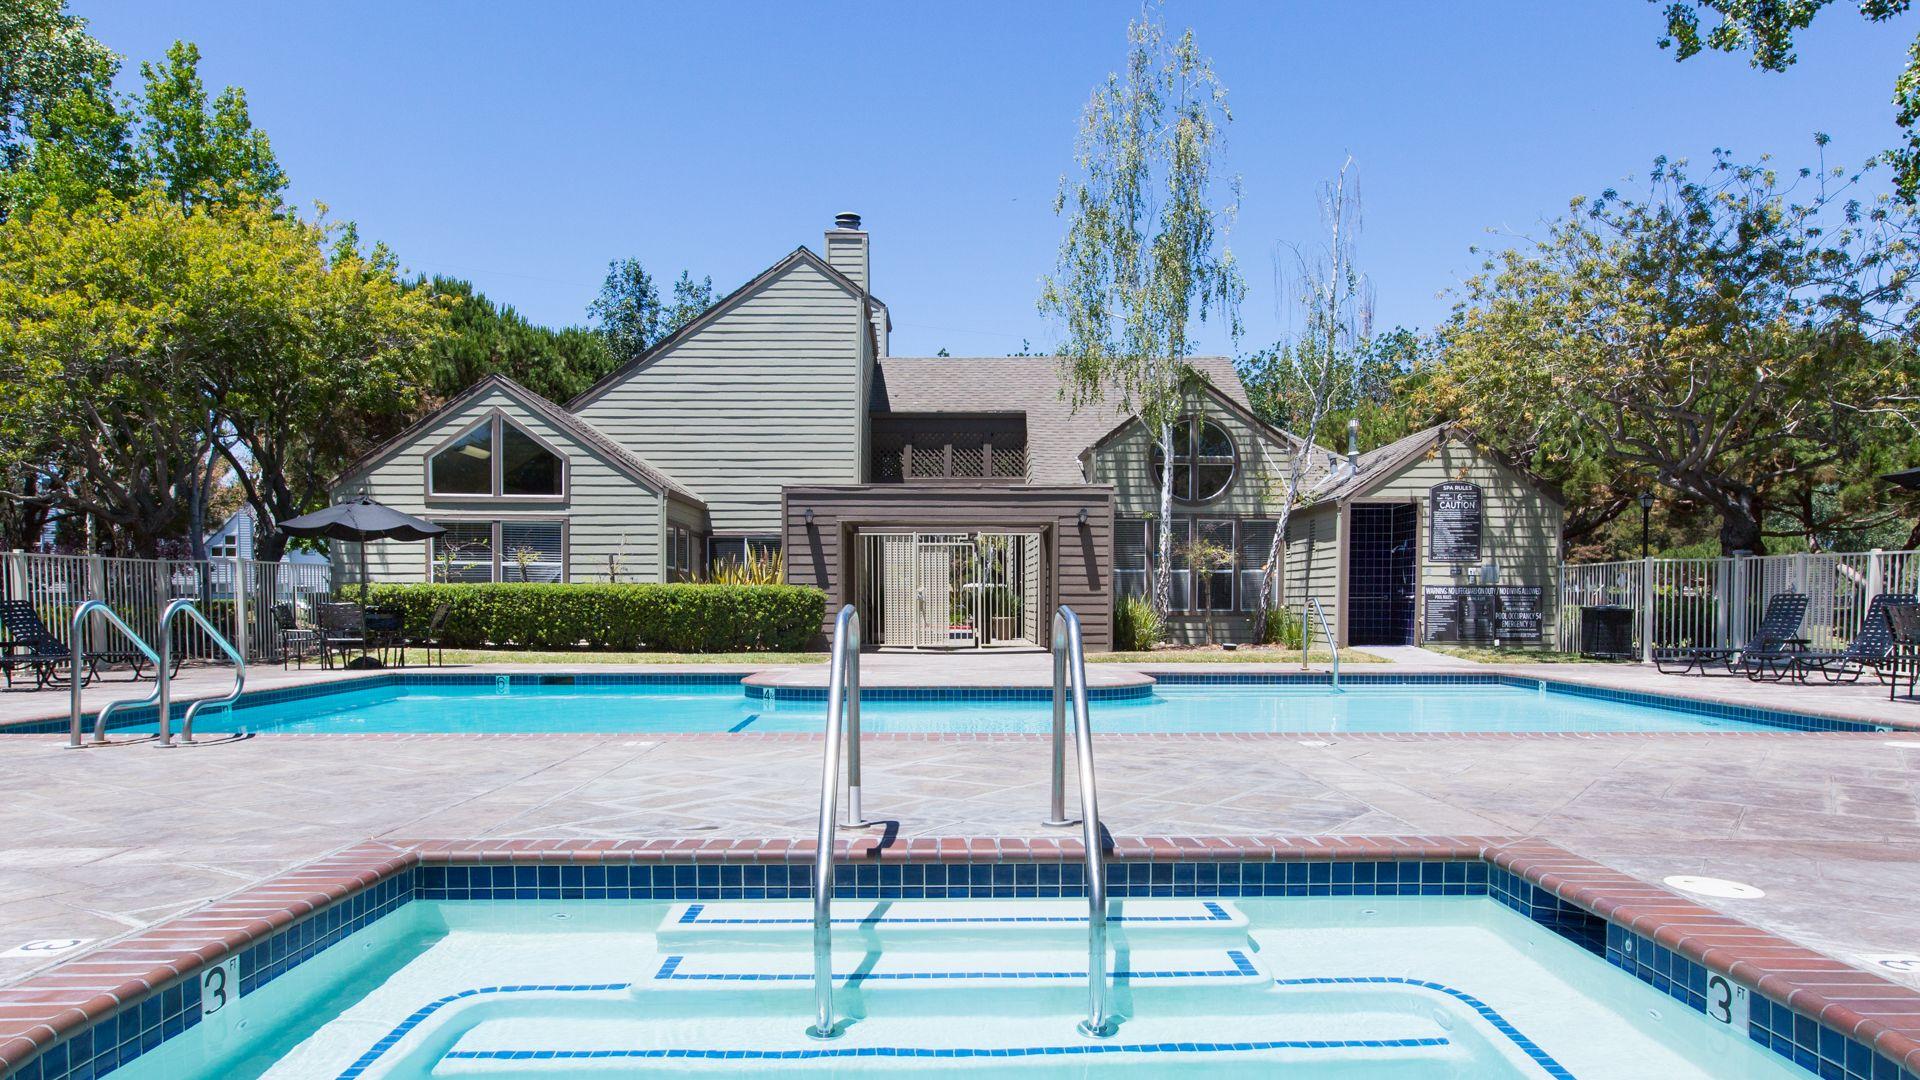 Schooner Bay Apartment Homes - Pool and Hot Tub